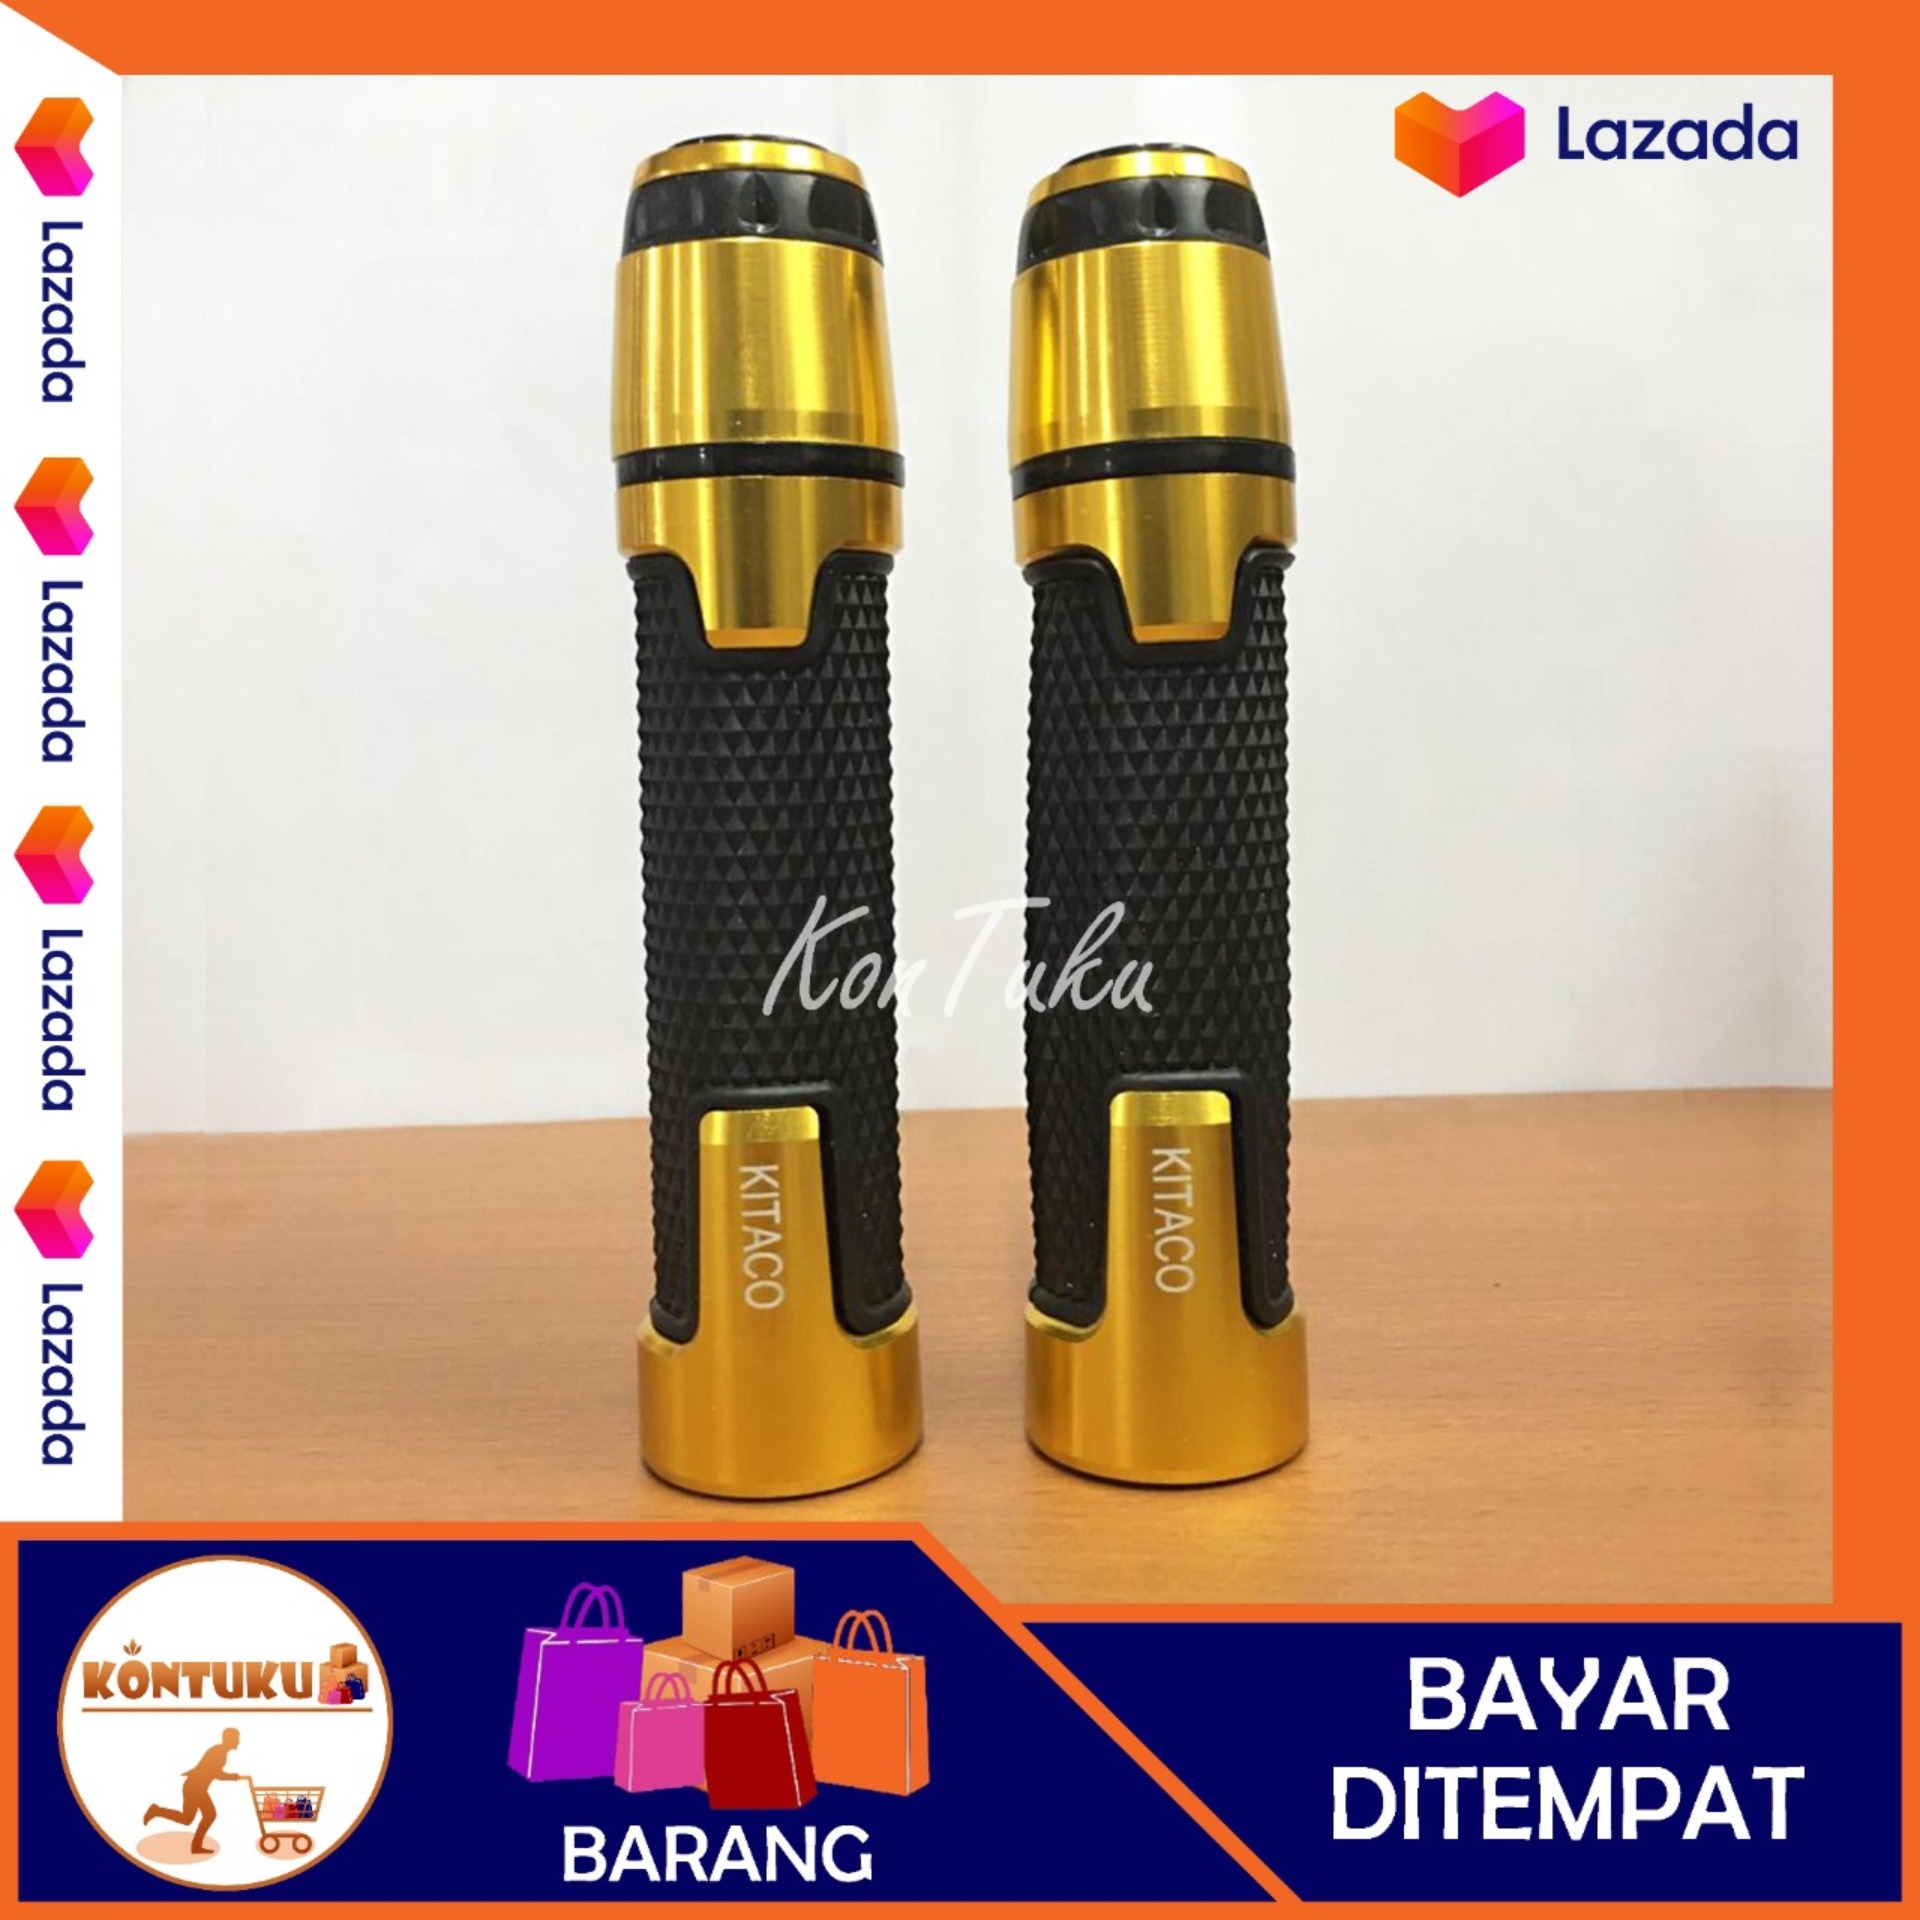 handgrip motor handle kitaco cnc / hendgrip model rcb / handgrip import all motor